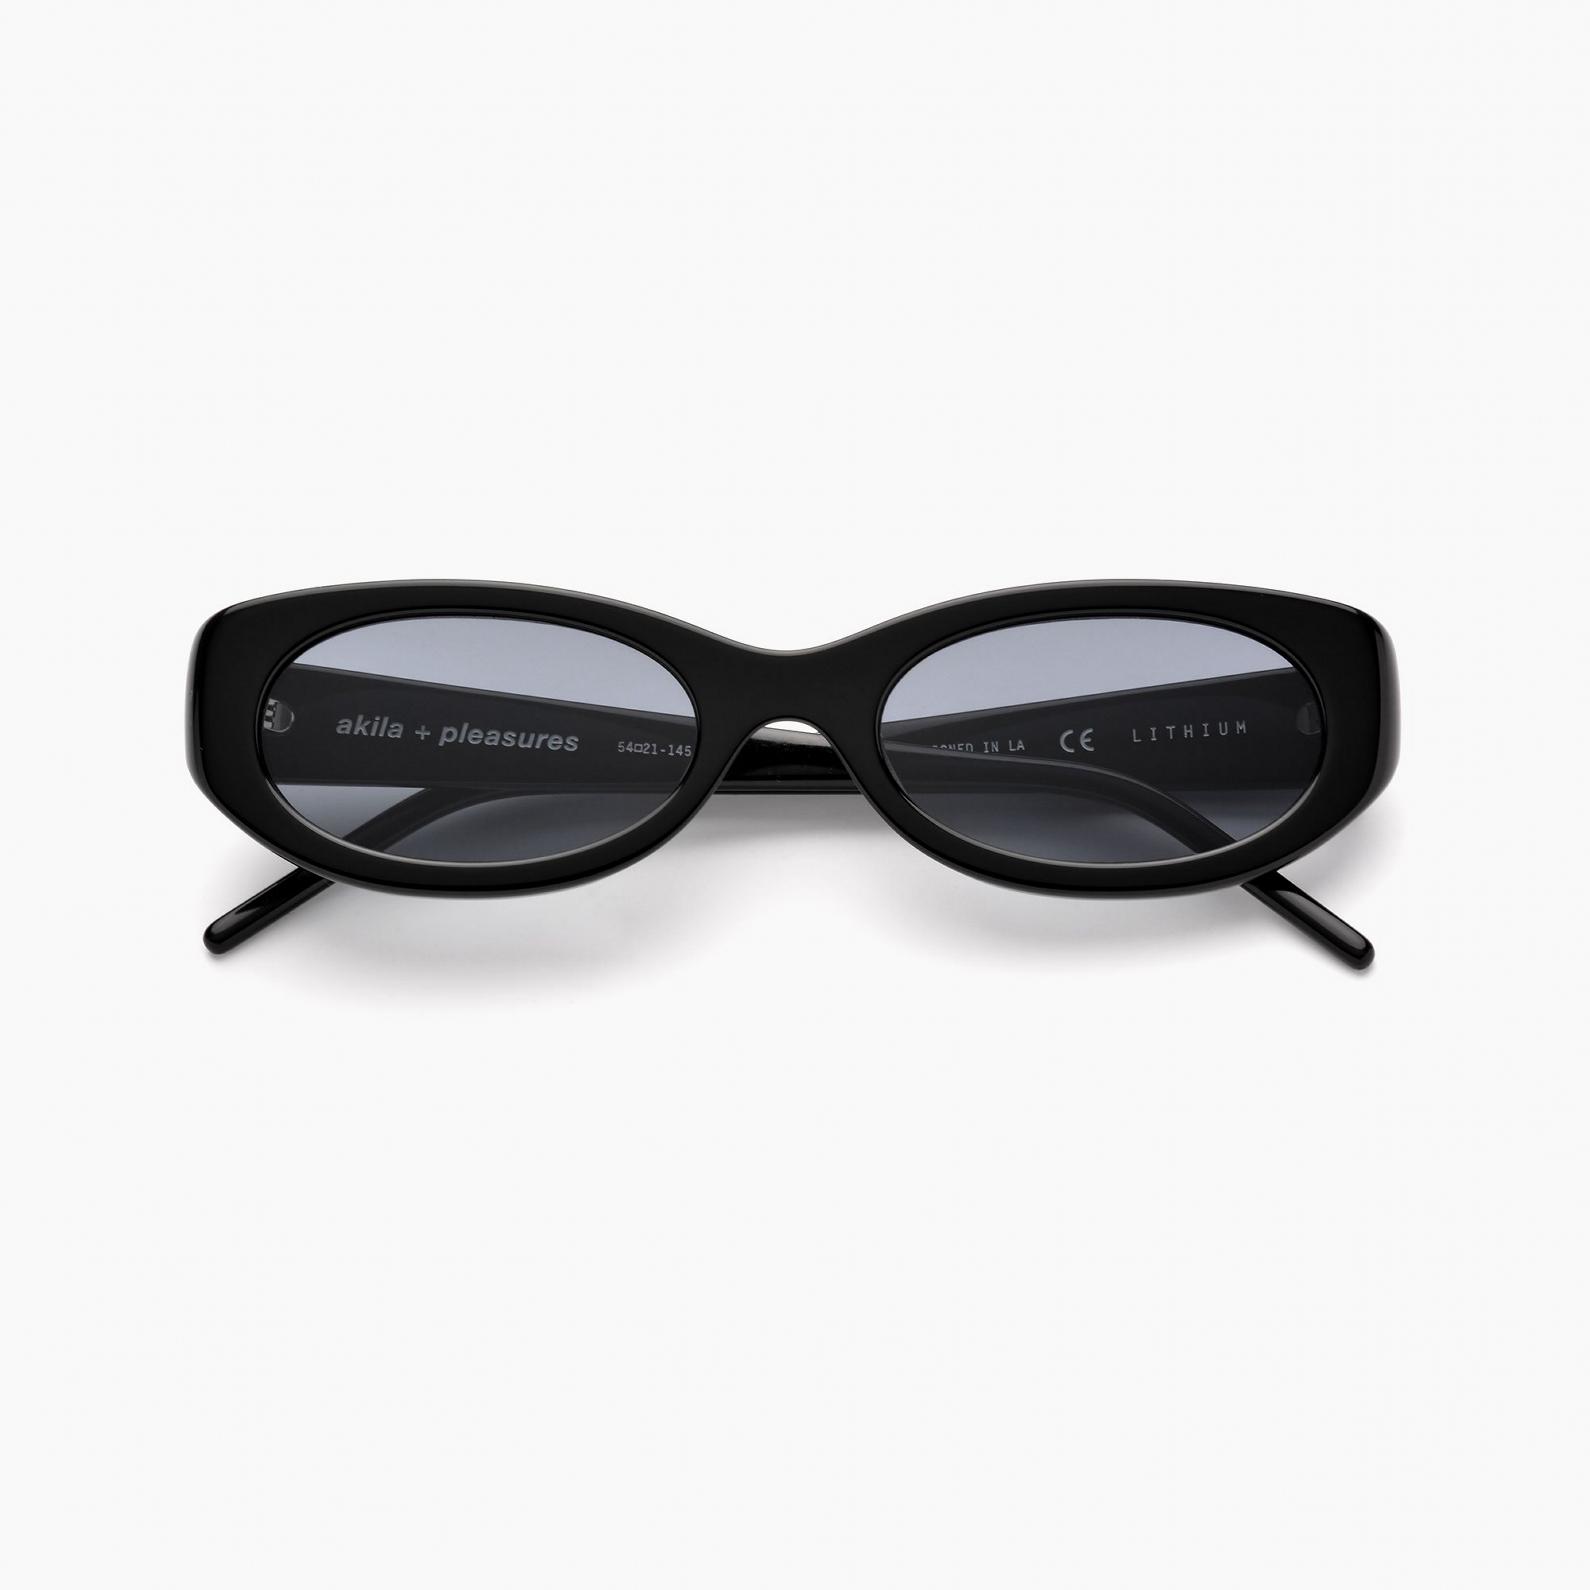 【PLEASURES/プレジャーズ】LITHIUM SUNGLASSES サングラス / BLACK